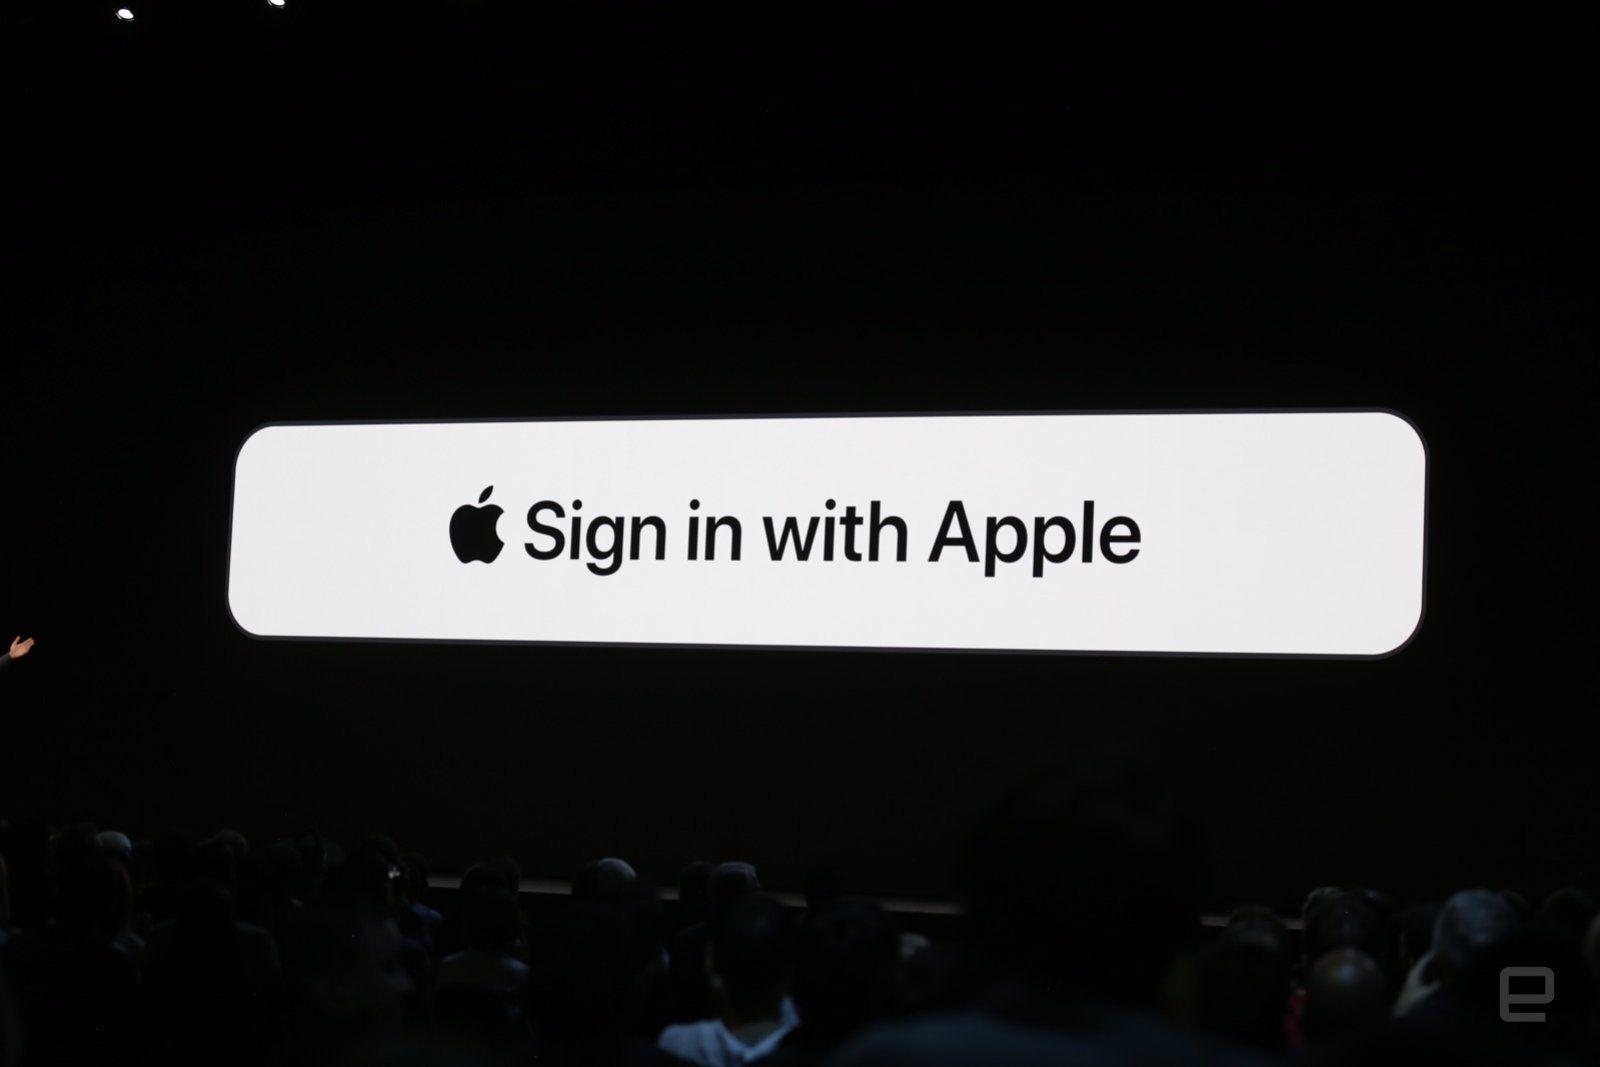 「Appleでサインイン」脆弱性の発見者に報奨金10万ドル。アカウント乗っ取りを未然に防止 - Engadget 日本版